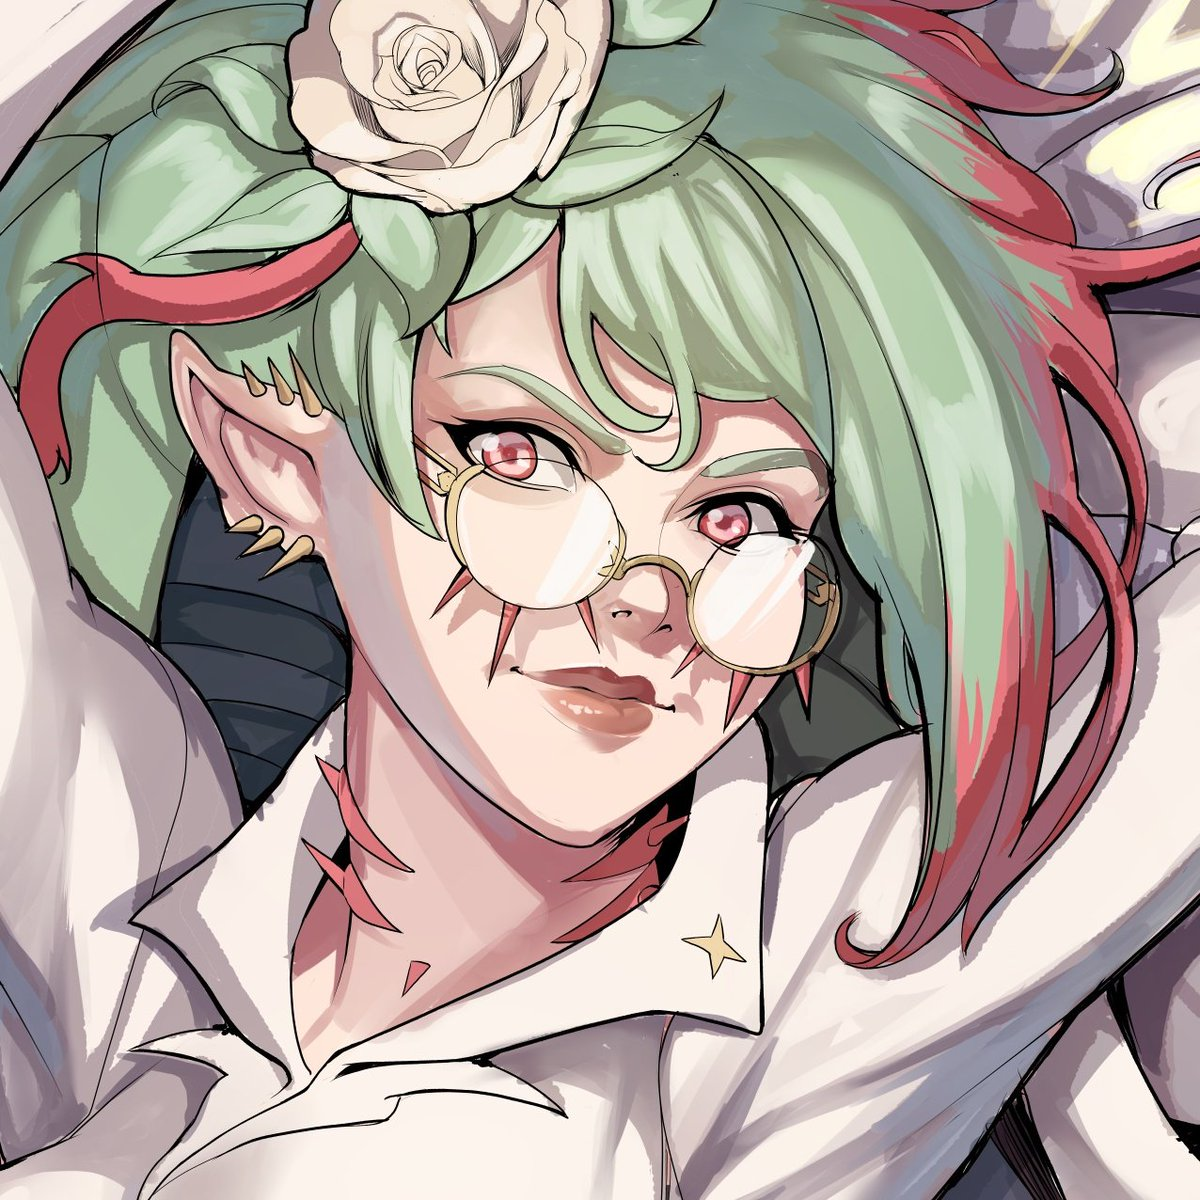 Rozsika  Commission for @Kuzfo  #artistsontwitter #animedrawing #animesketch #animestyle #art #character #characterart #characterconcept #characterdesign #conceptart #drawing #arte #illustration #manga #commissionsopen https://t.co/WclcT2VEkB